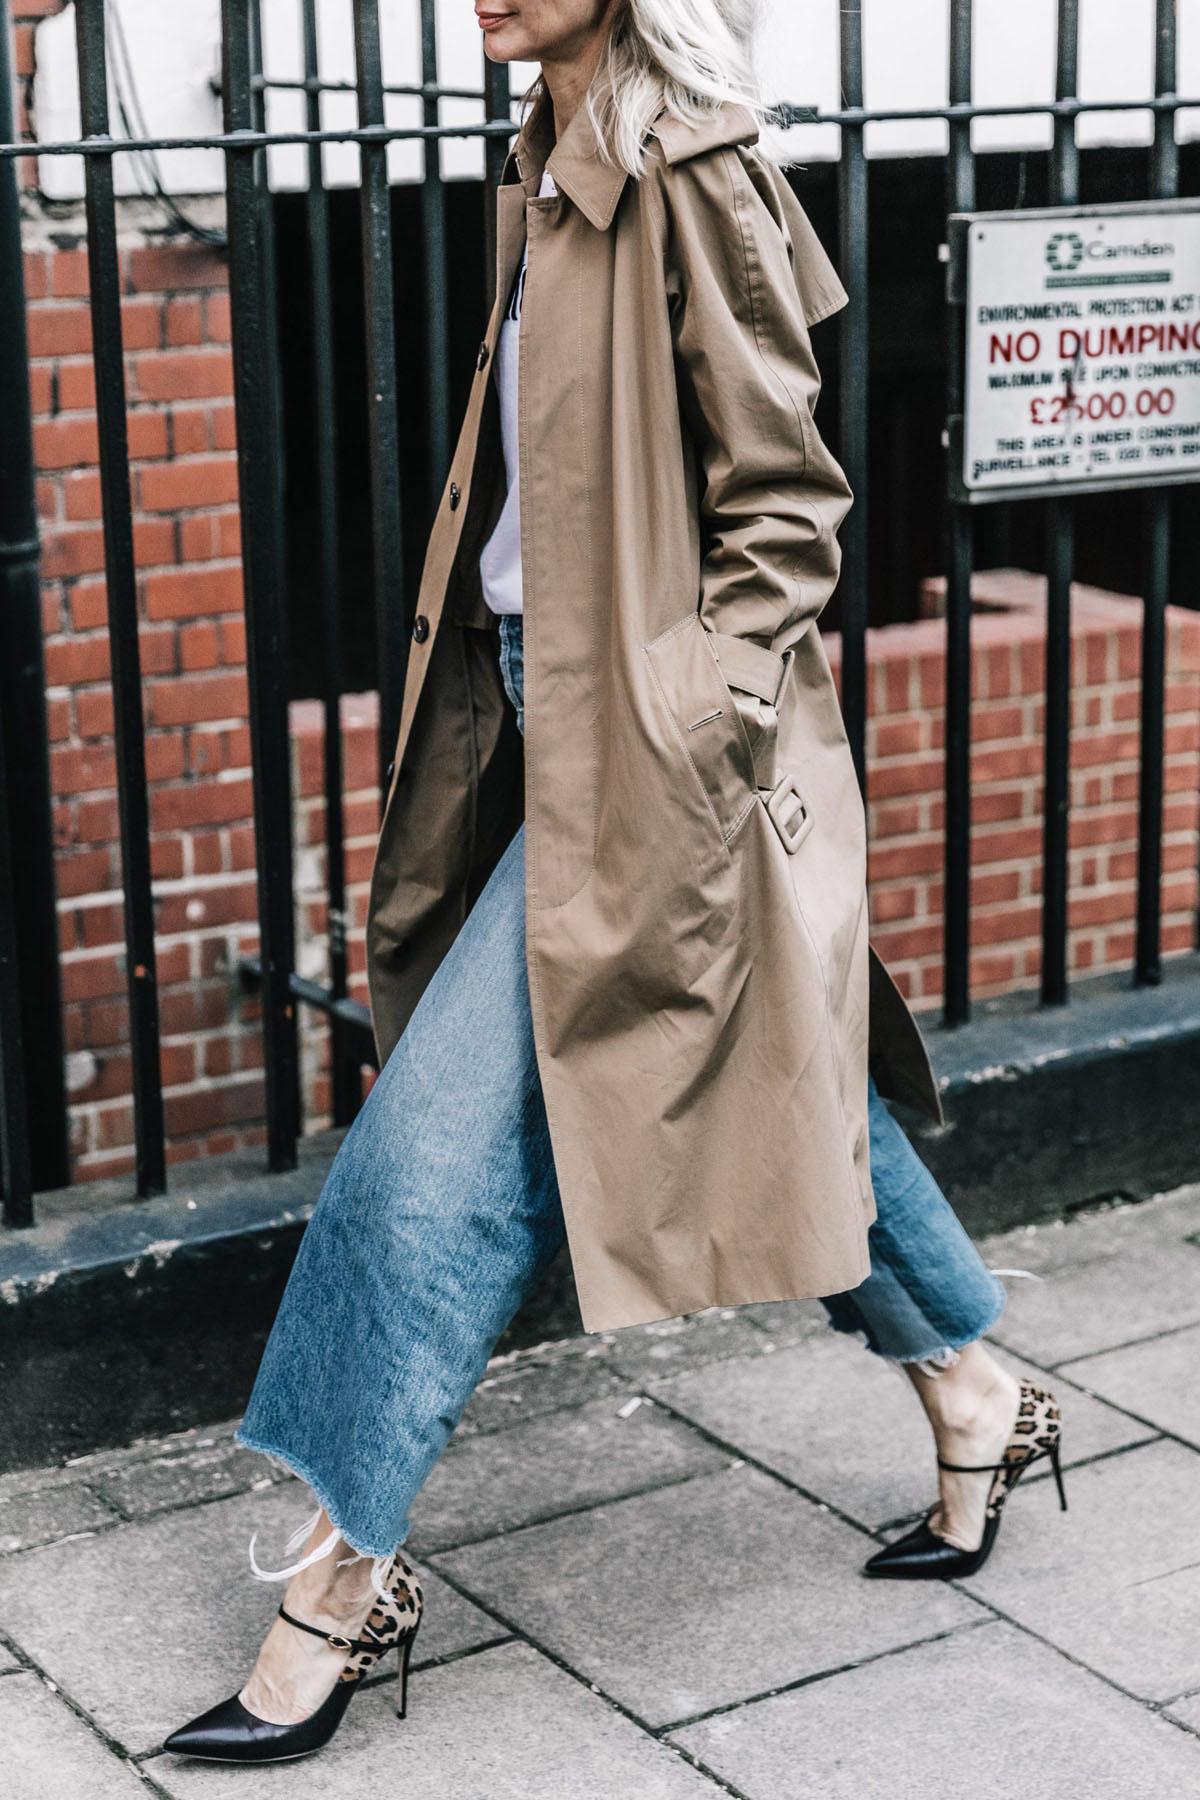 London_Fashion_Week_Fall_2017-LFW-JW_Anderson-Julien_Macdonald-Ports1961-Street_Style-205-1800x2700